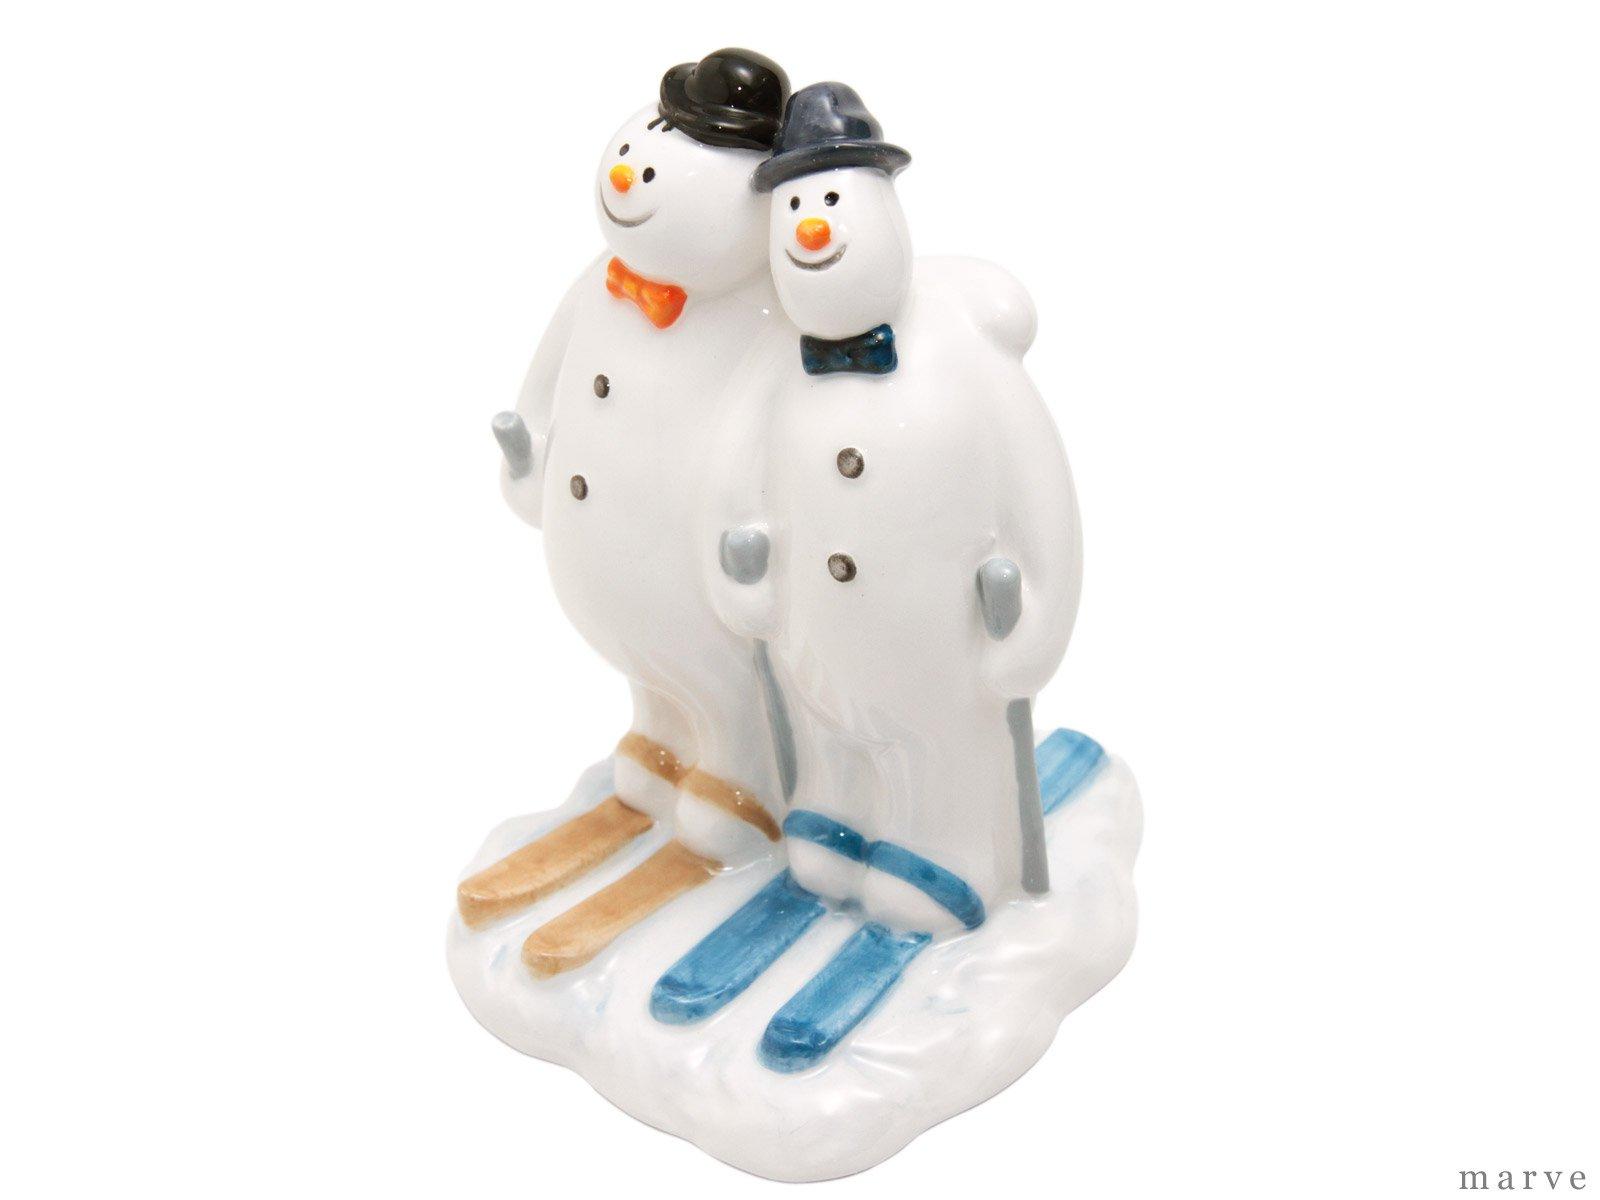 The Snowman フィギュリン コミックスノーマン